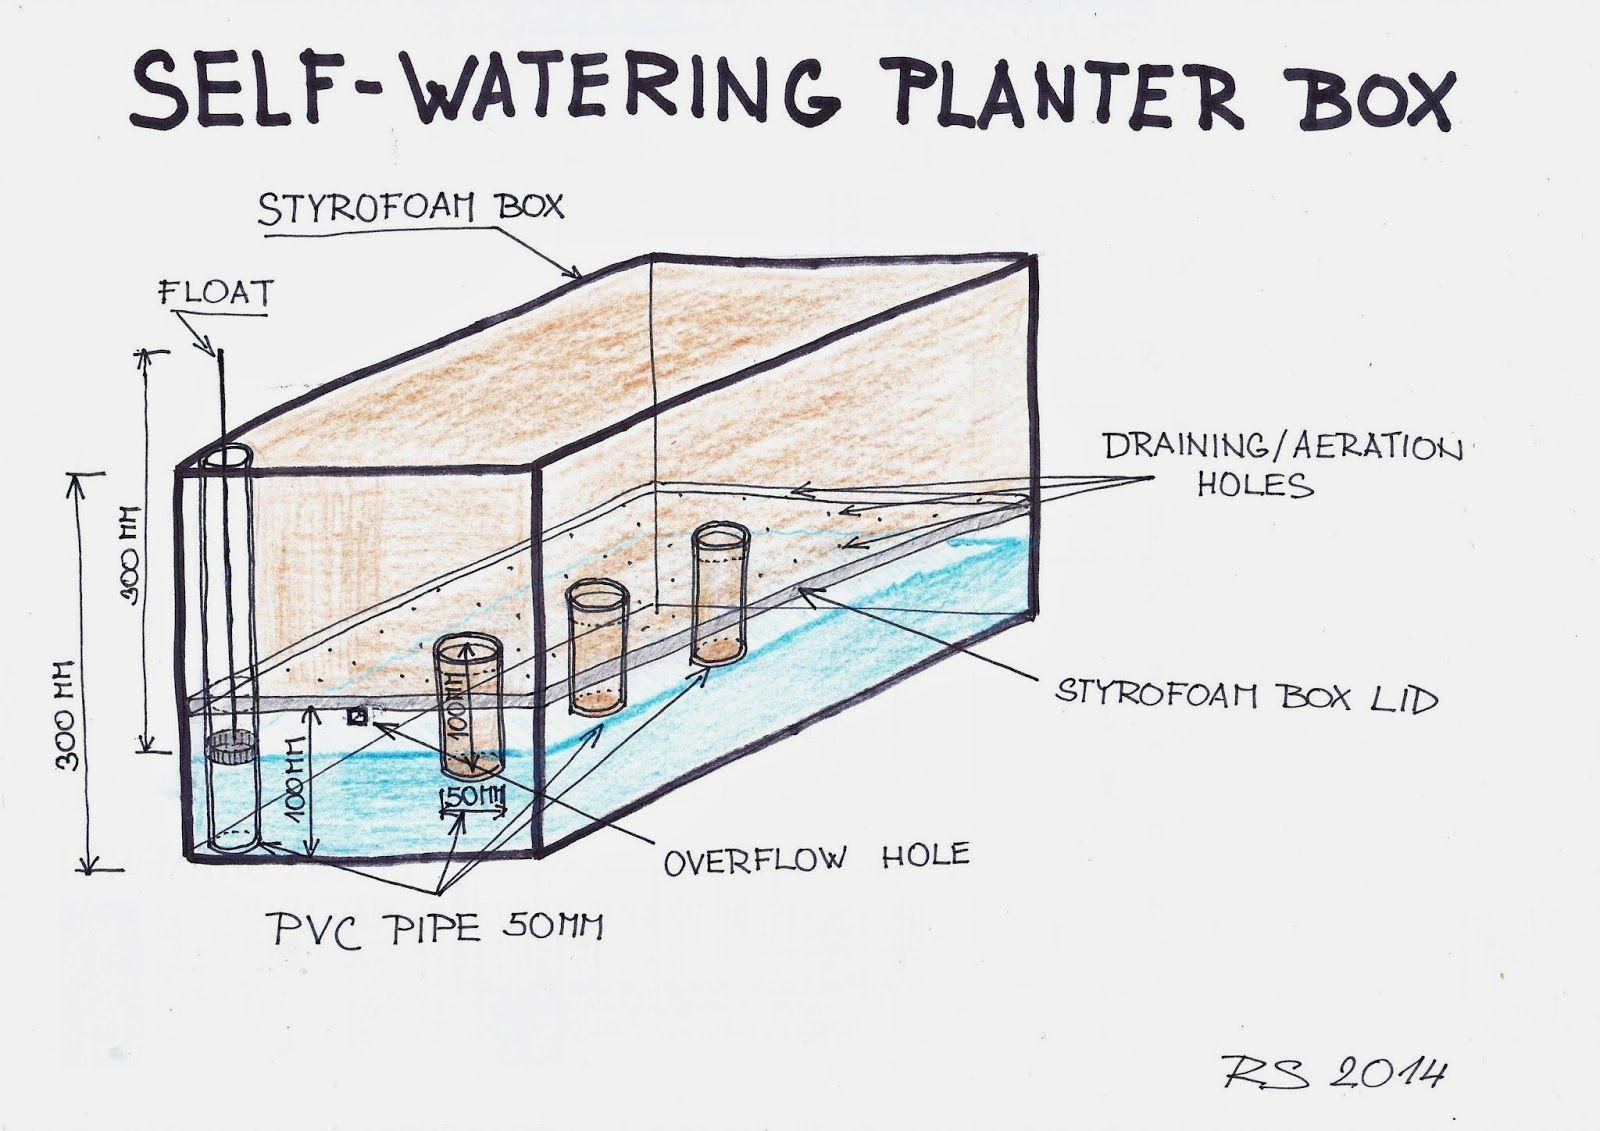 self watering planter box schematic diagram self watering planters [ 1600 x 1131 Pixel ]